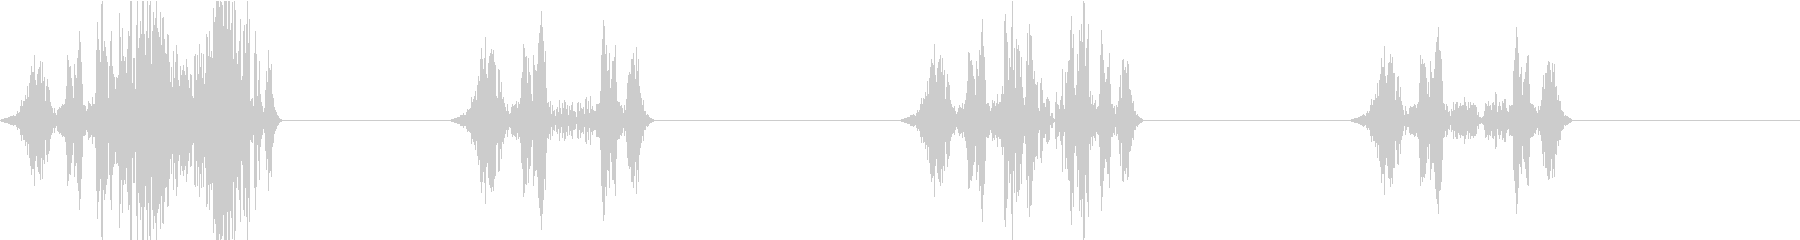 DJプレイ スクラッチ・ノイズ 112の未再生の波形